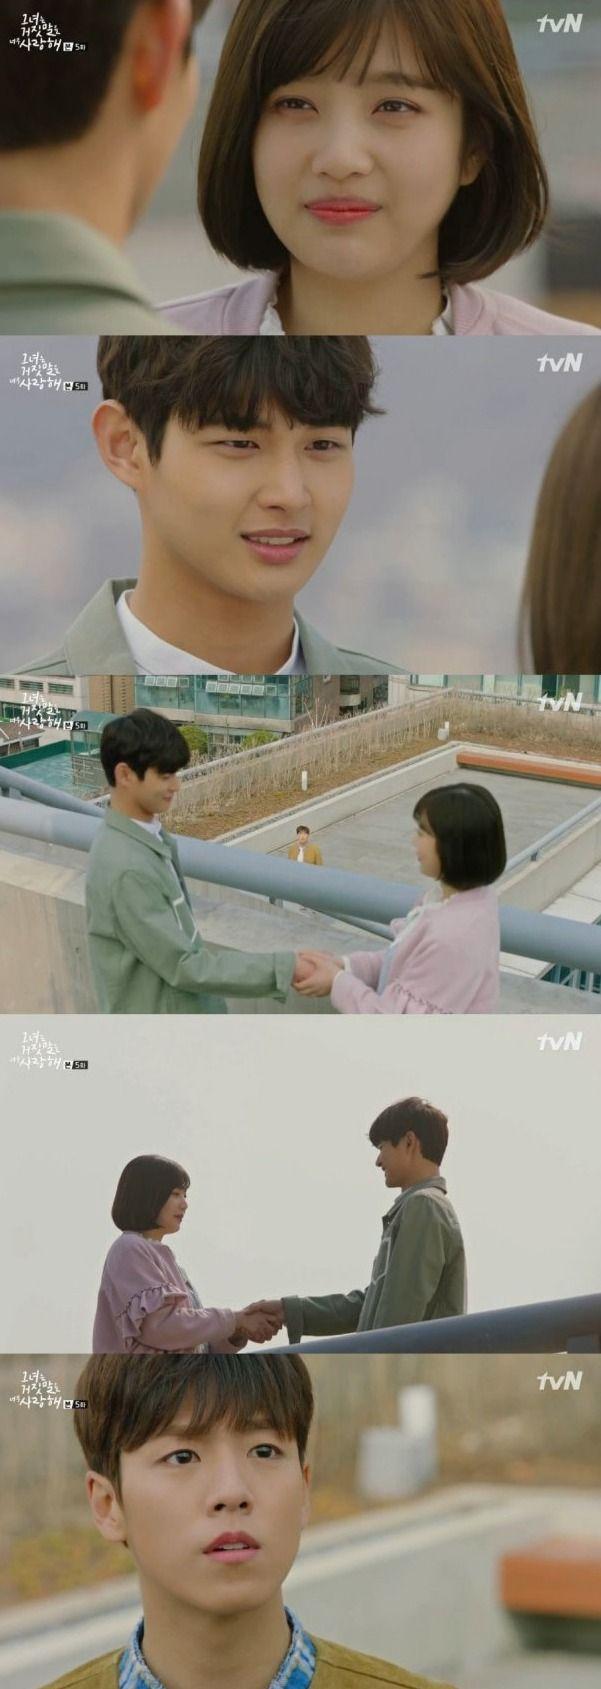 Spoiler Added Episode 5 Captures For The Kdrama The Liar And His Lover Dramas Coreanos Ver Drama Coreano Drama Coreano